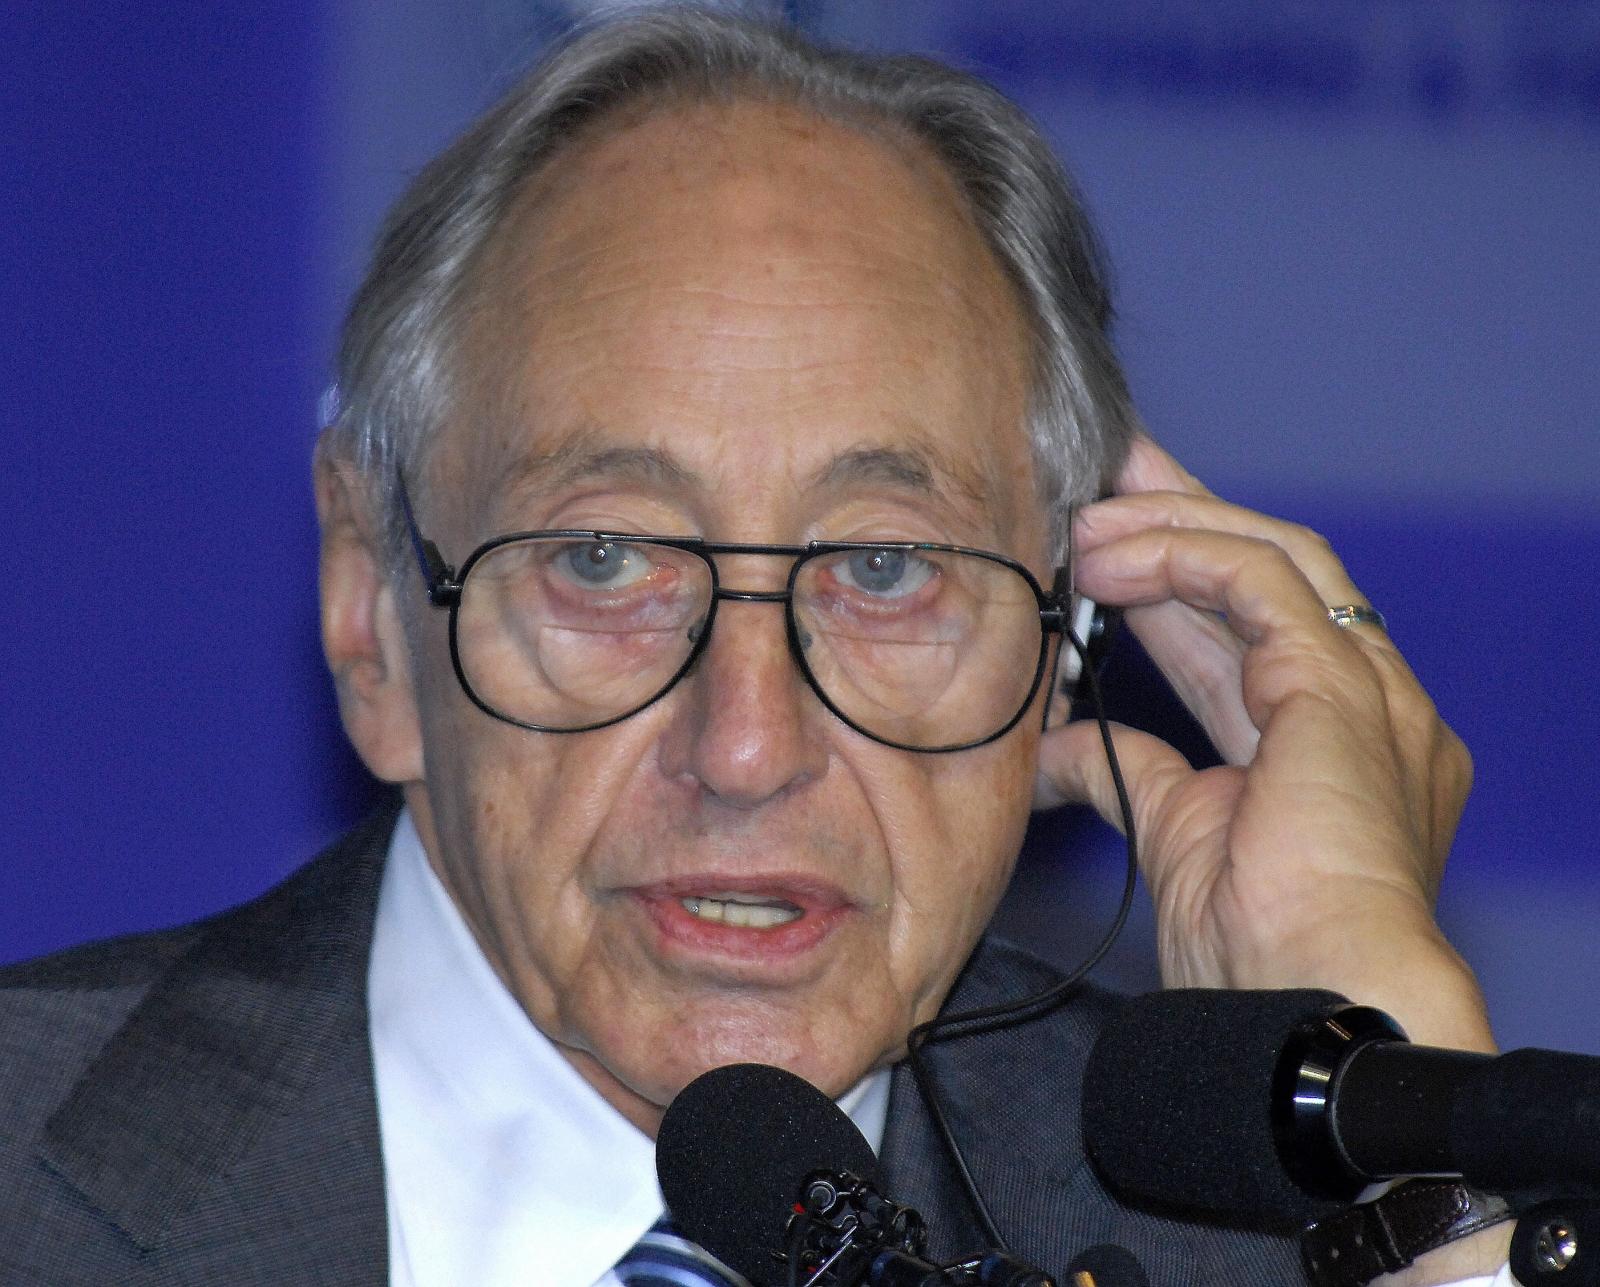 Futurist Alvin Toffler